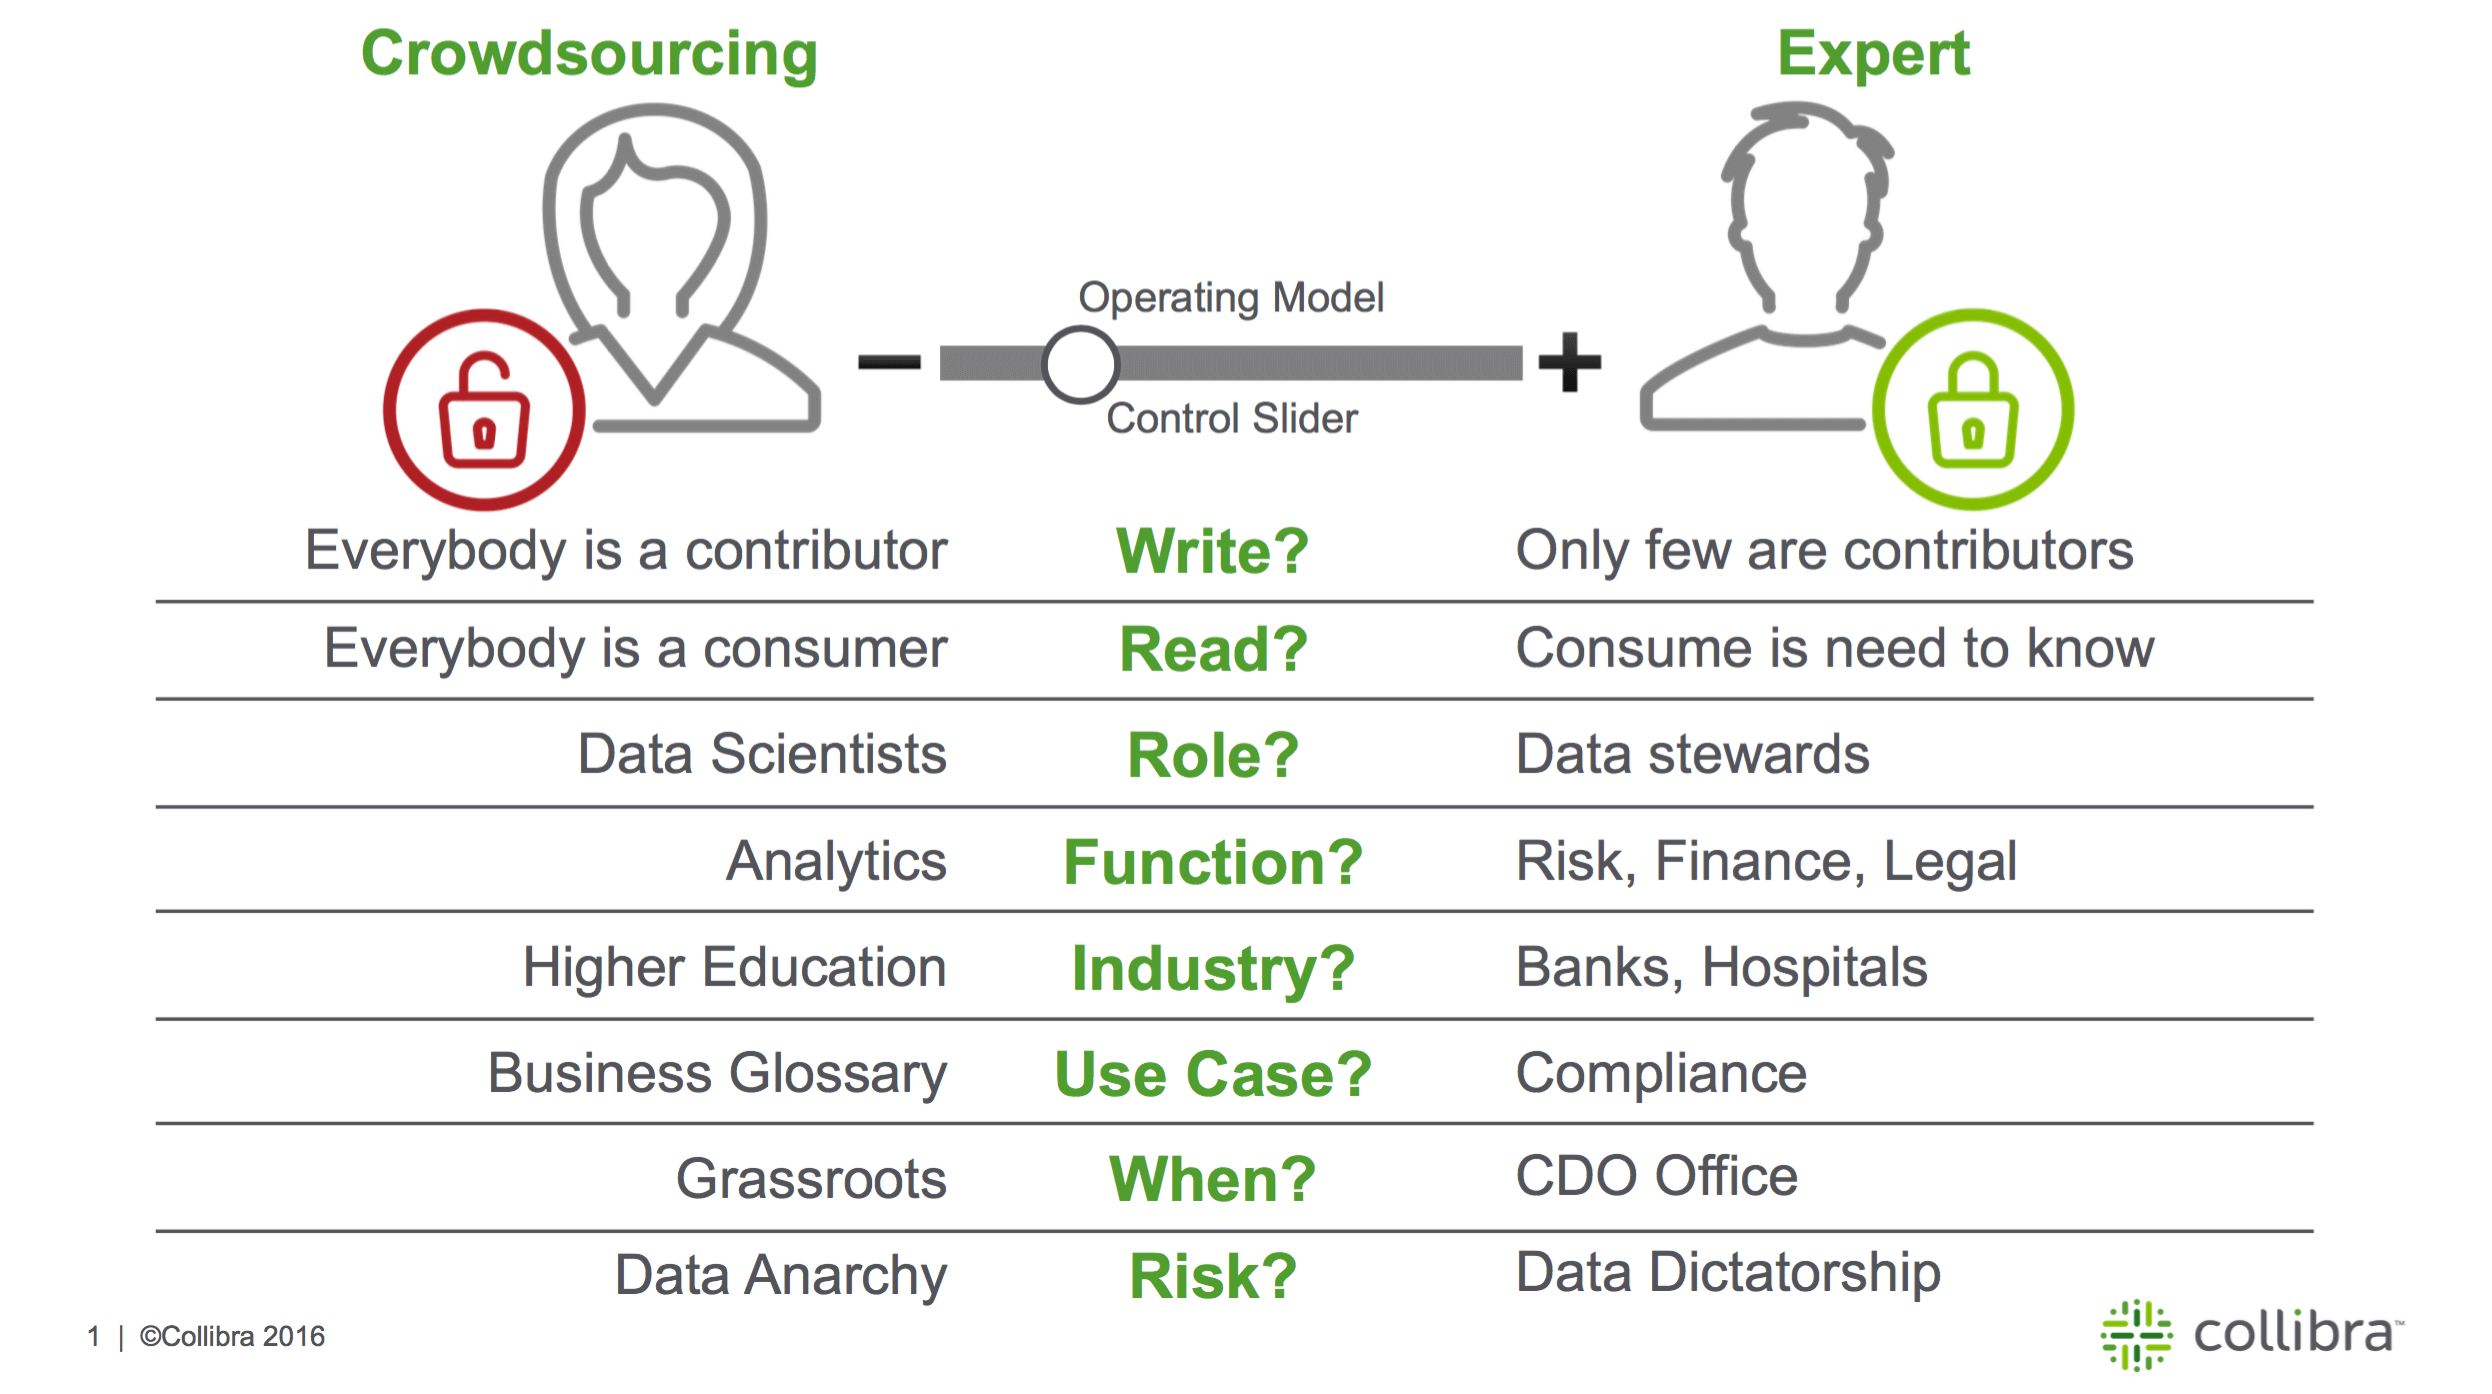 Crowdsourcing Data Governance